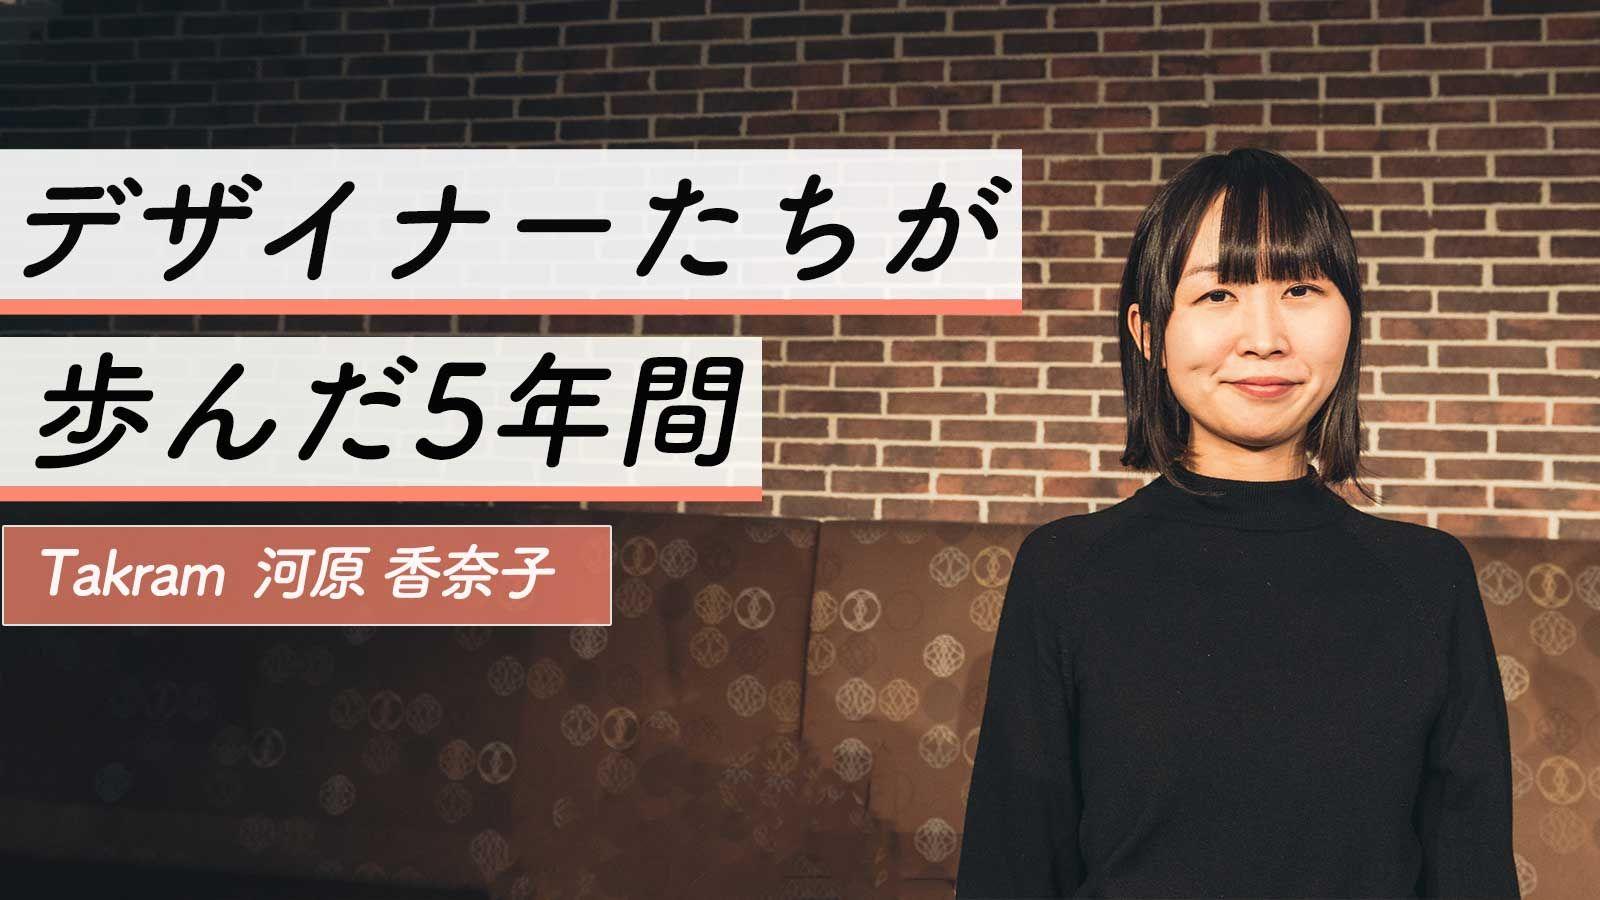 BANK解散を経て、Takramへ。デザインに向き合うためにーー河原香奈子が選んだ次なるキャリア